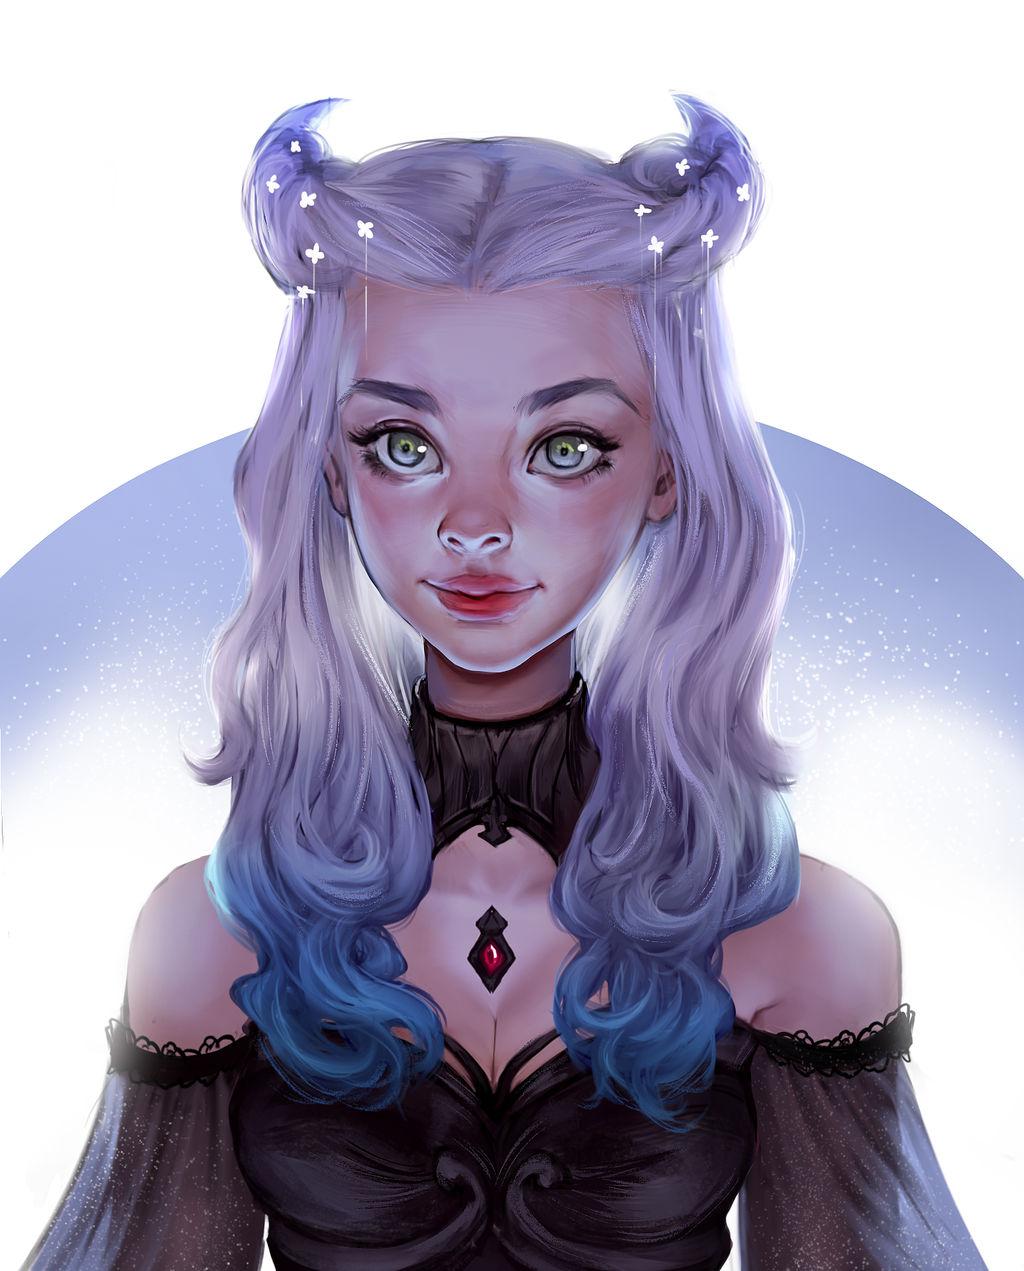 Night Queen by Iruuse